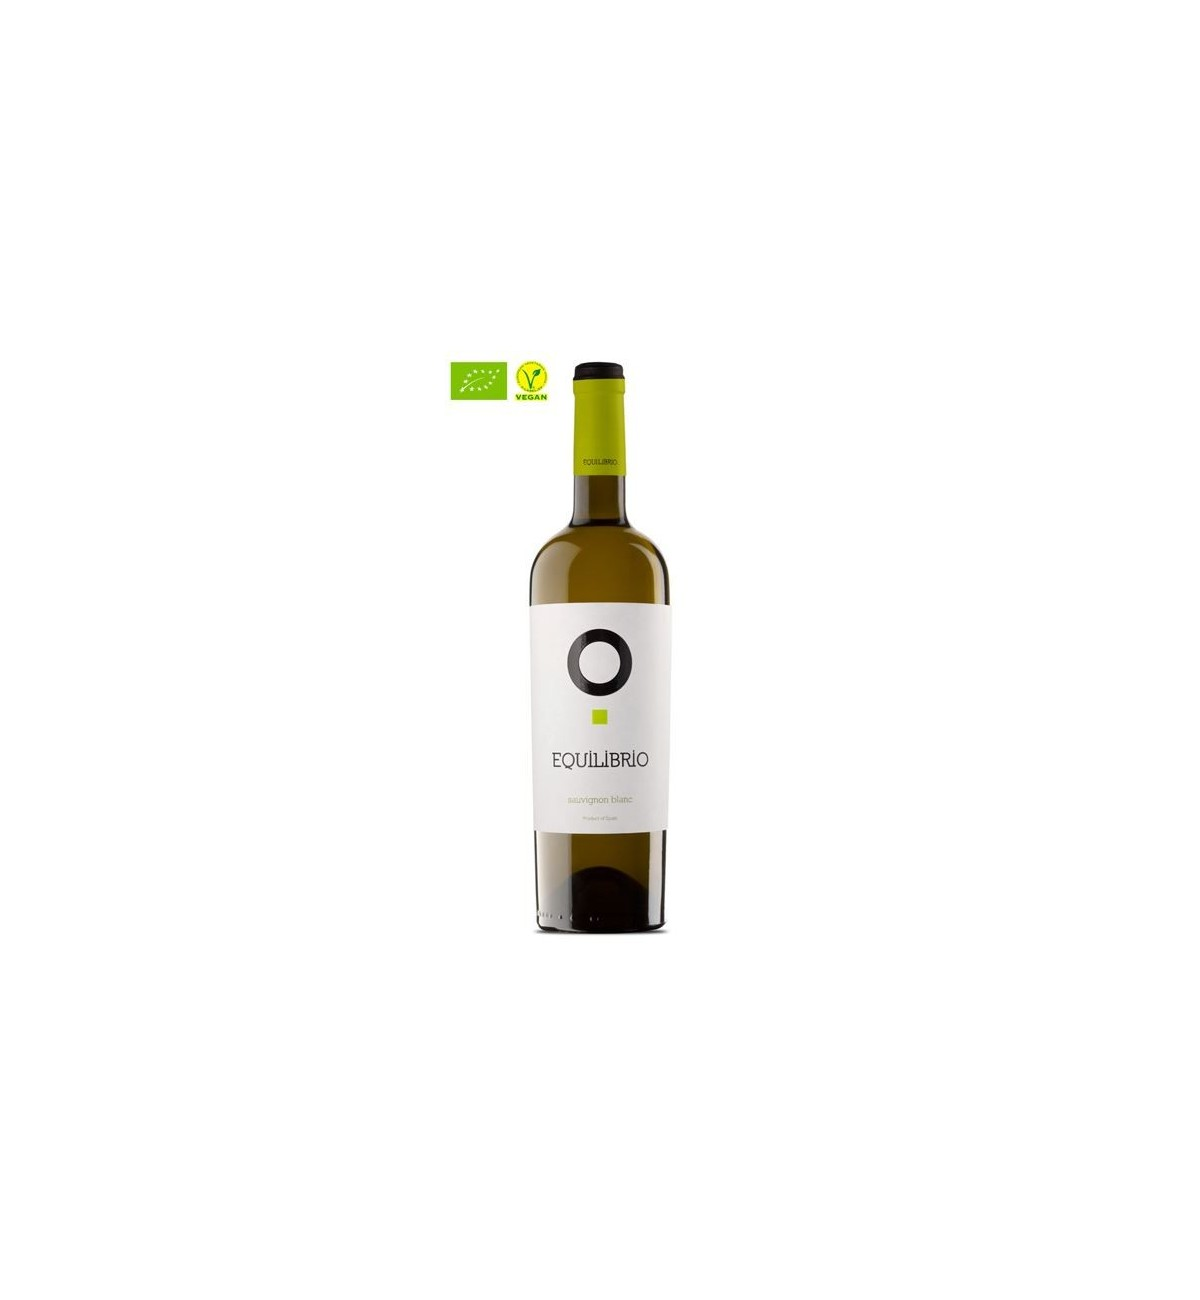 Equilibrio * Vino Blanco Sauvignon Blanc, Sierra Norte, Jumilla